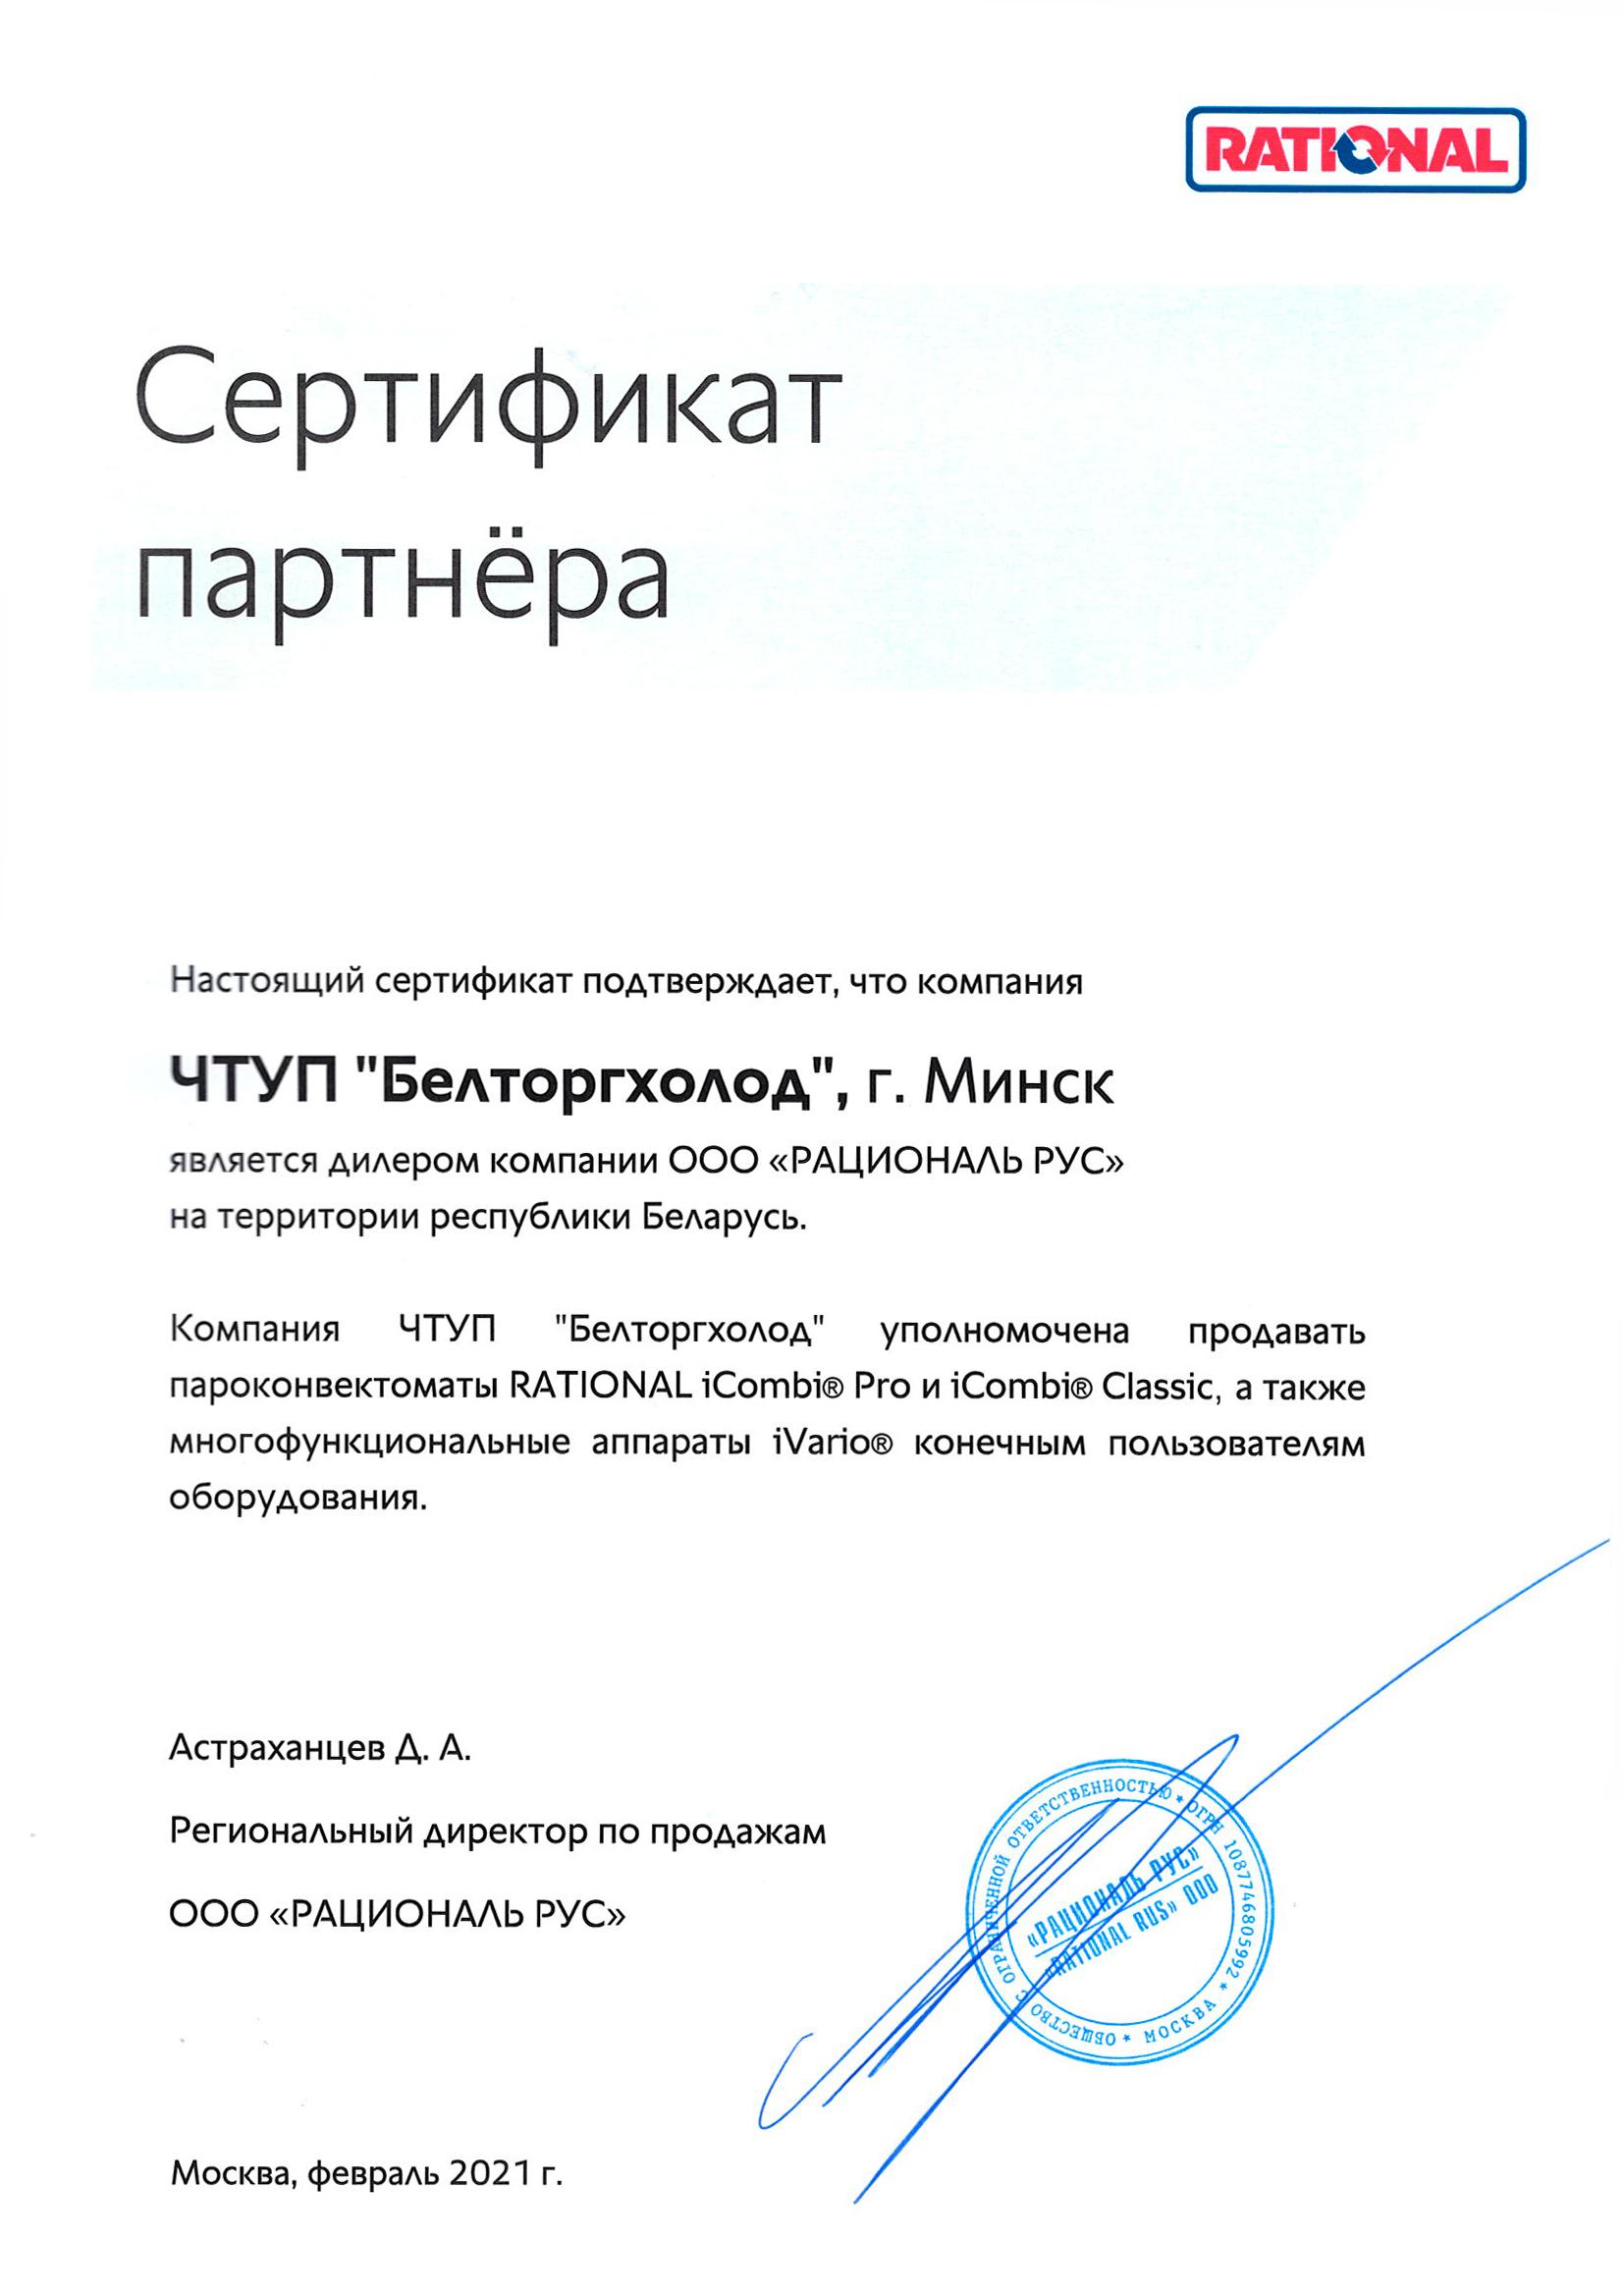 Сертификат ТМ RATIONAL